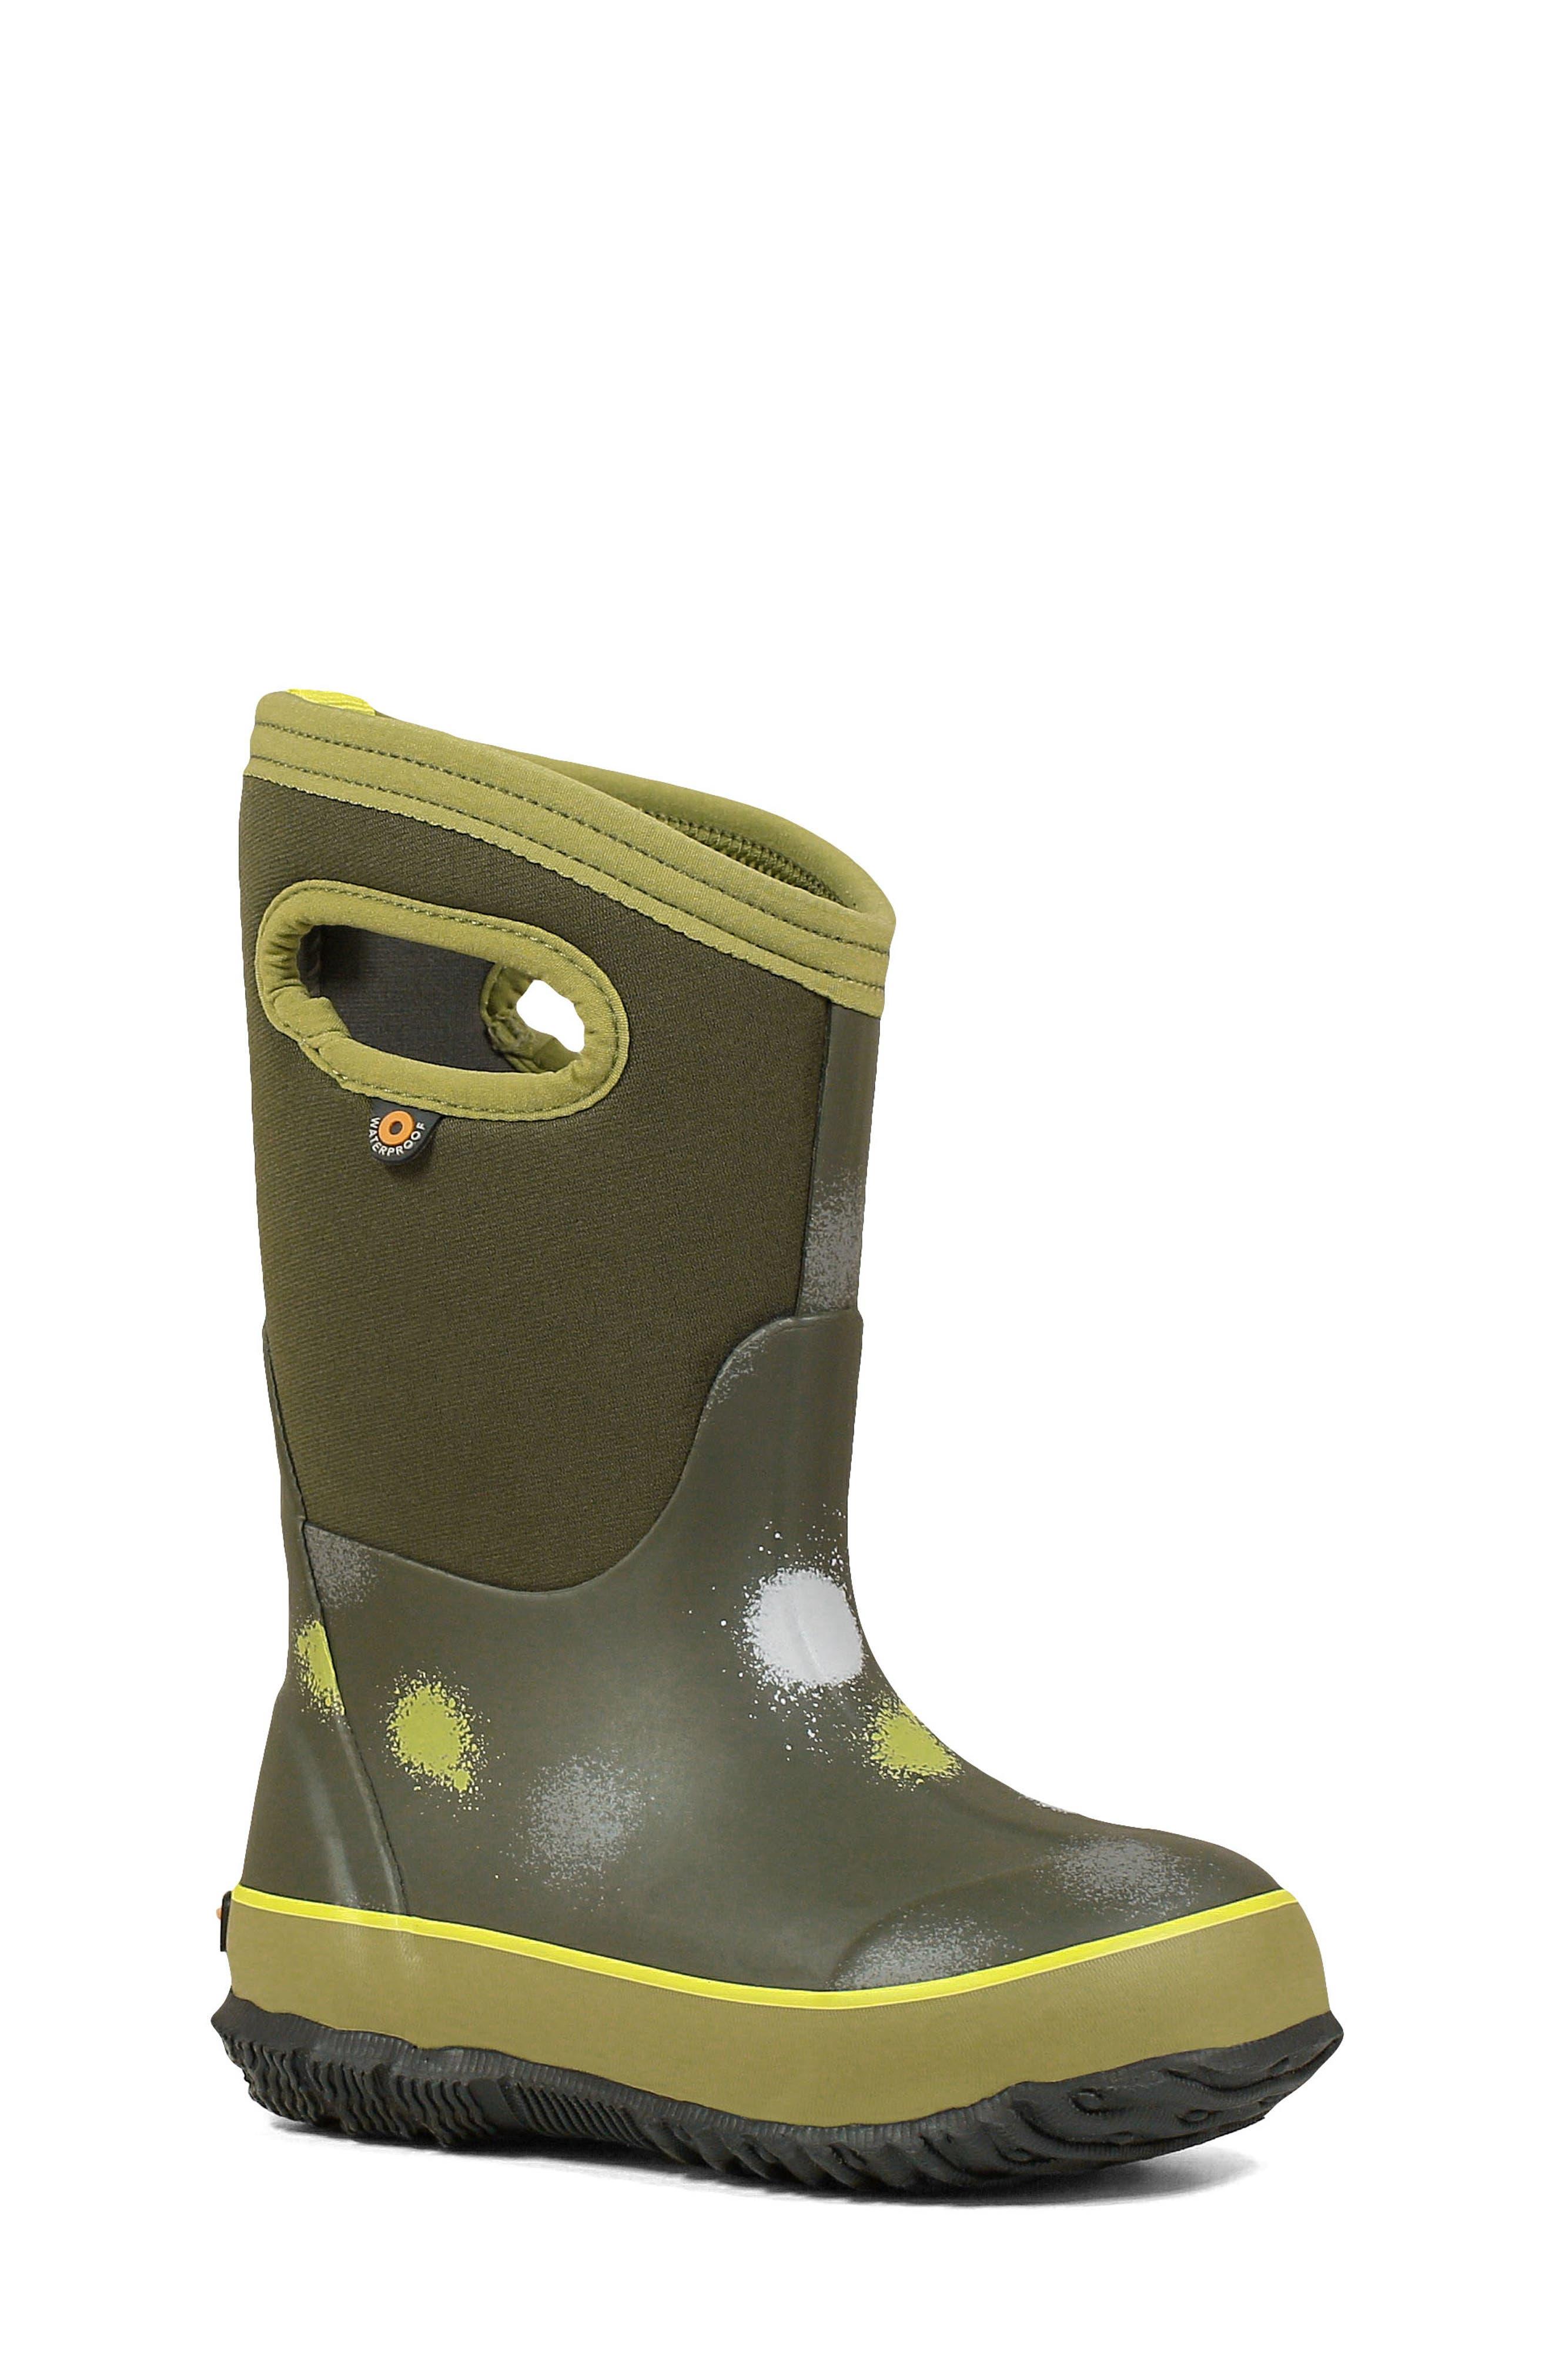 Image of Bogs Classic B Funprint Waterproof Boot